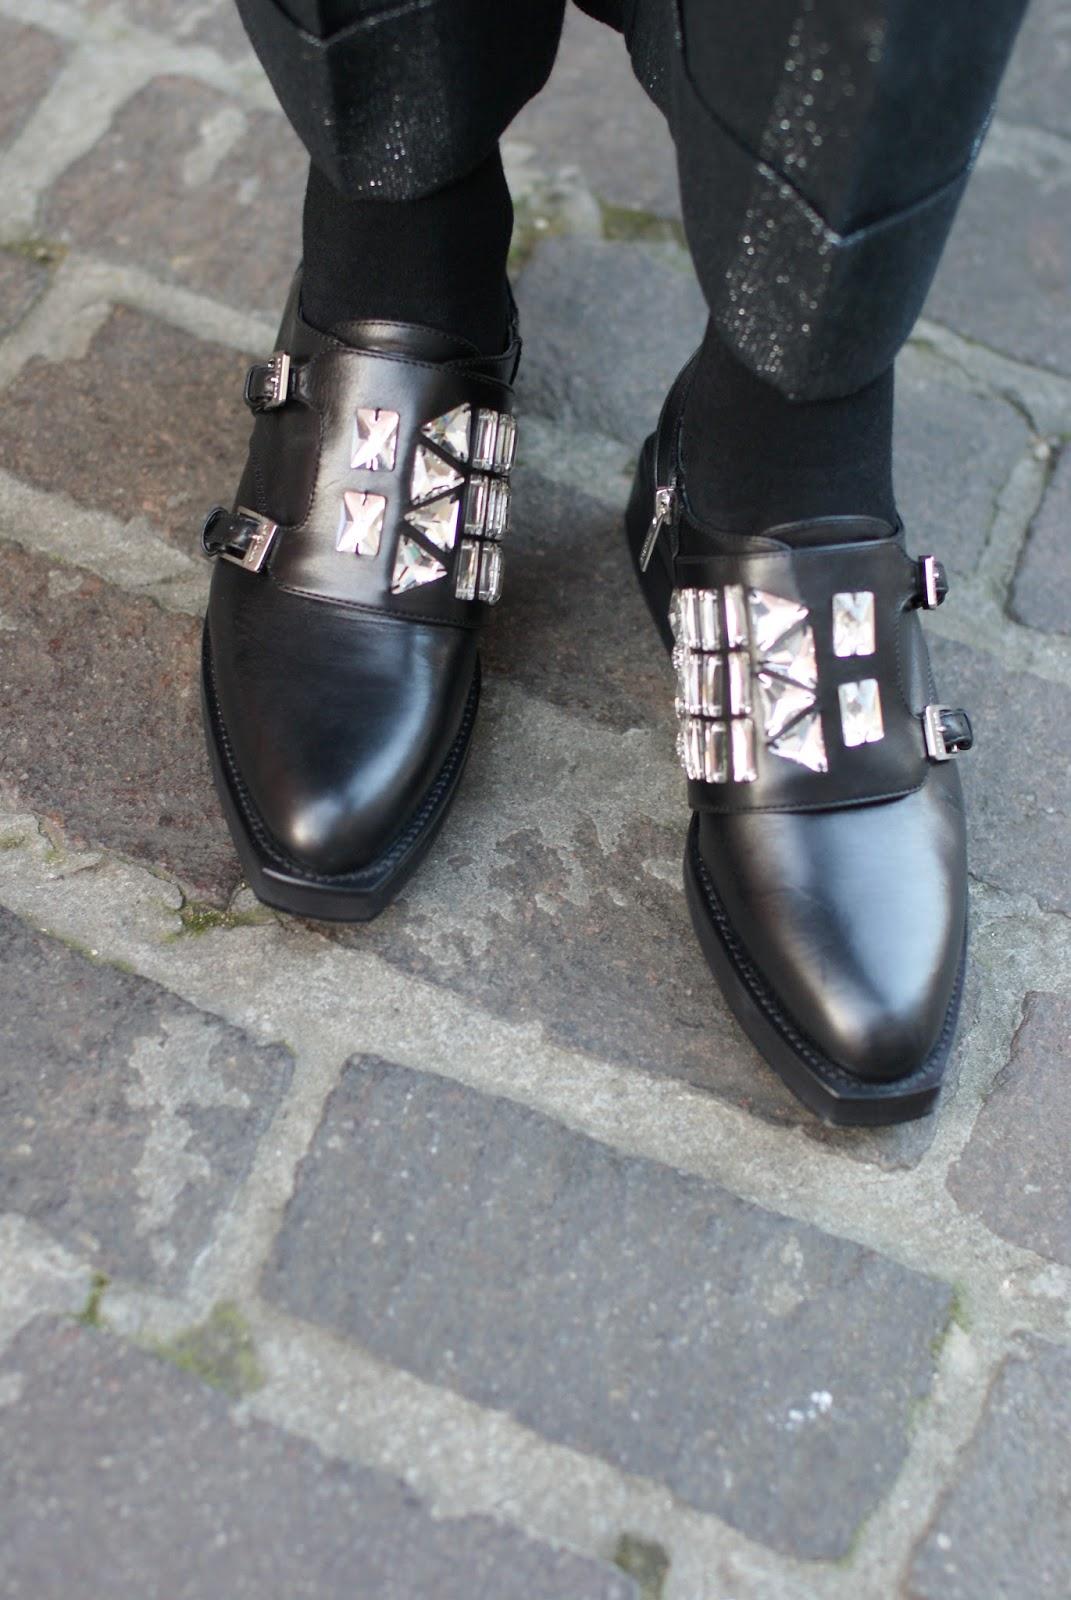 Elegant Le Silla jeweled brogues on Fashion and Cookies fashion blog, fashion blogger style